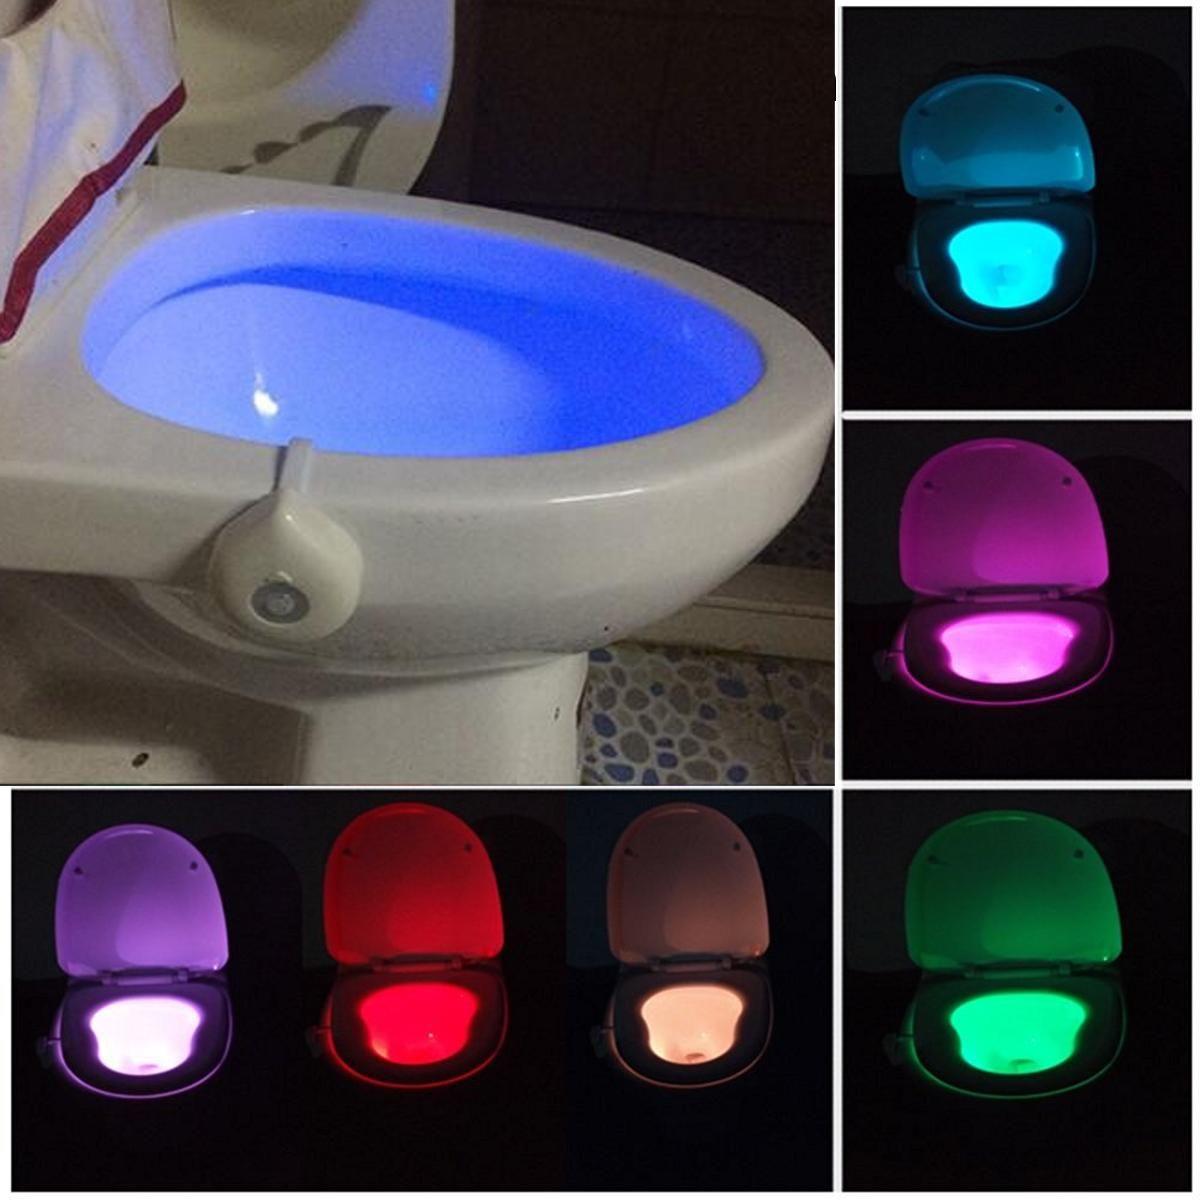 Motion Activated Toilet Night Light Bowl Bathroom LED 8 Color Lamp Sensor  Lights. Motion Activated Toilet Night Light Bowl Bathroom LED 8 Color Lamp